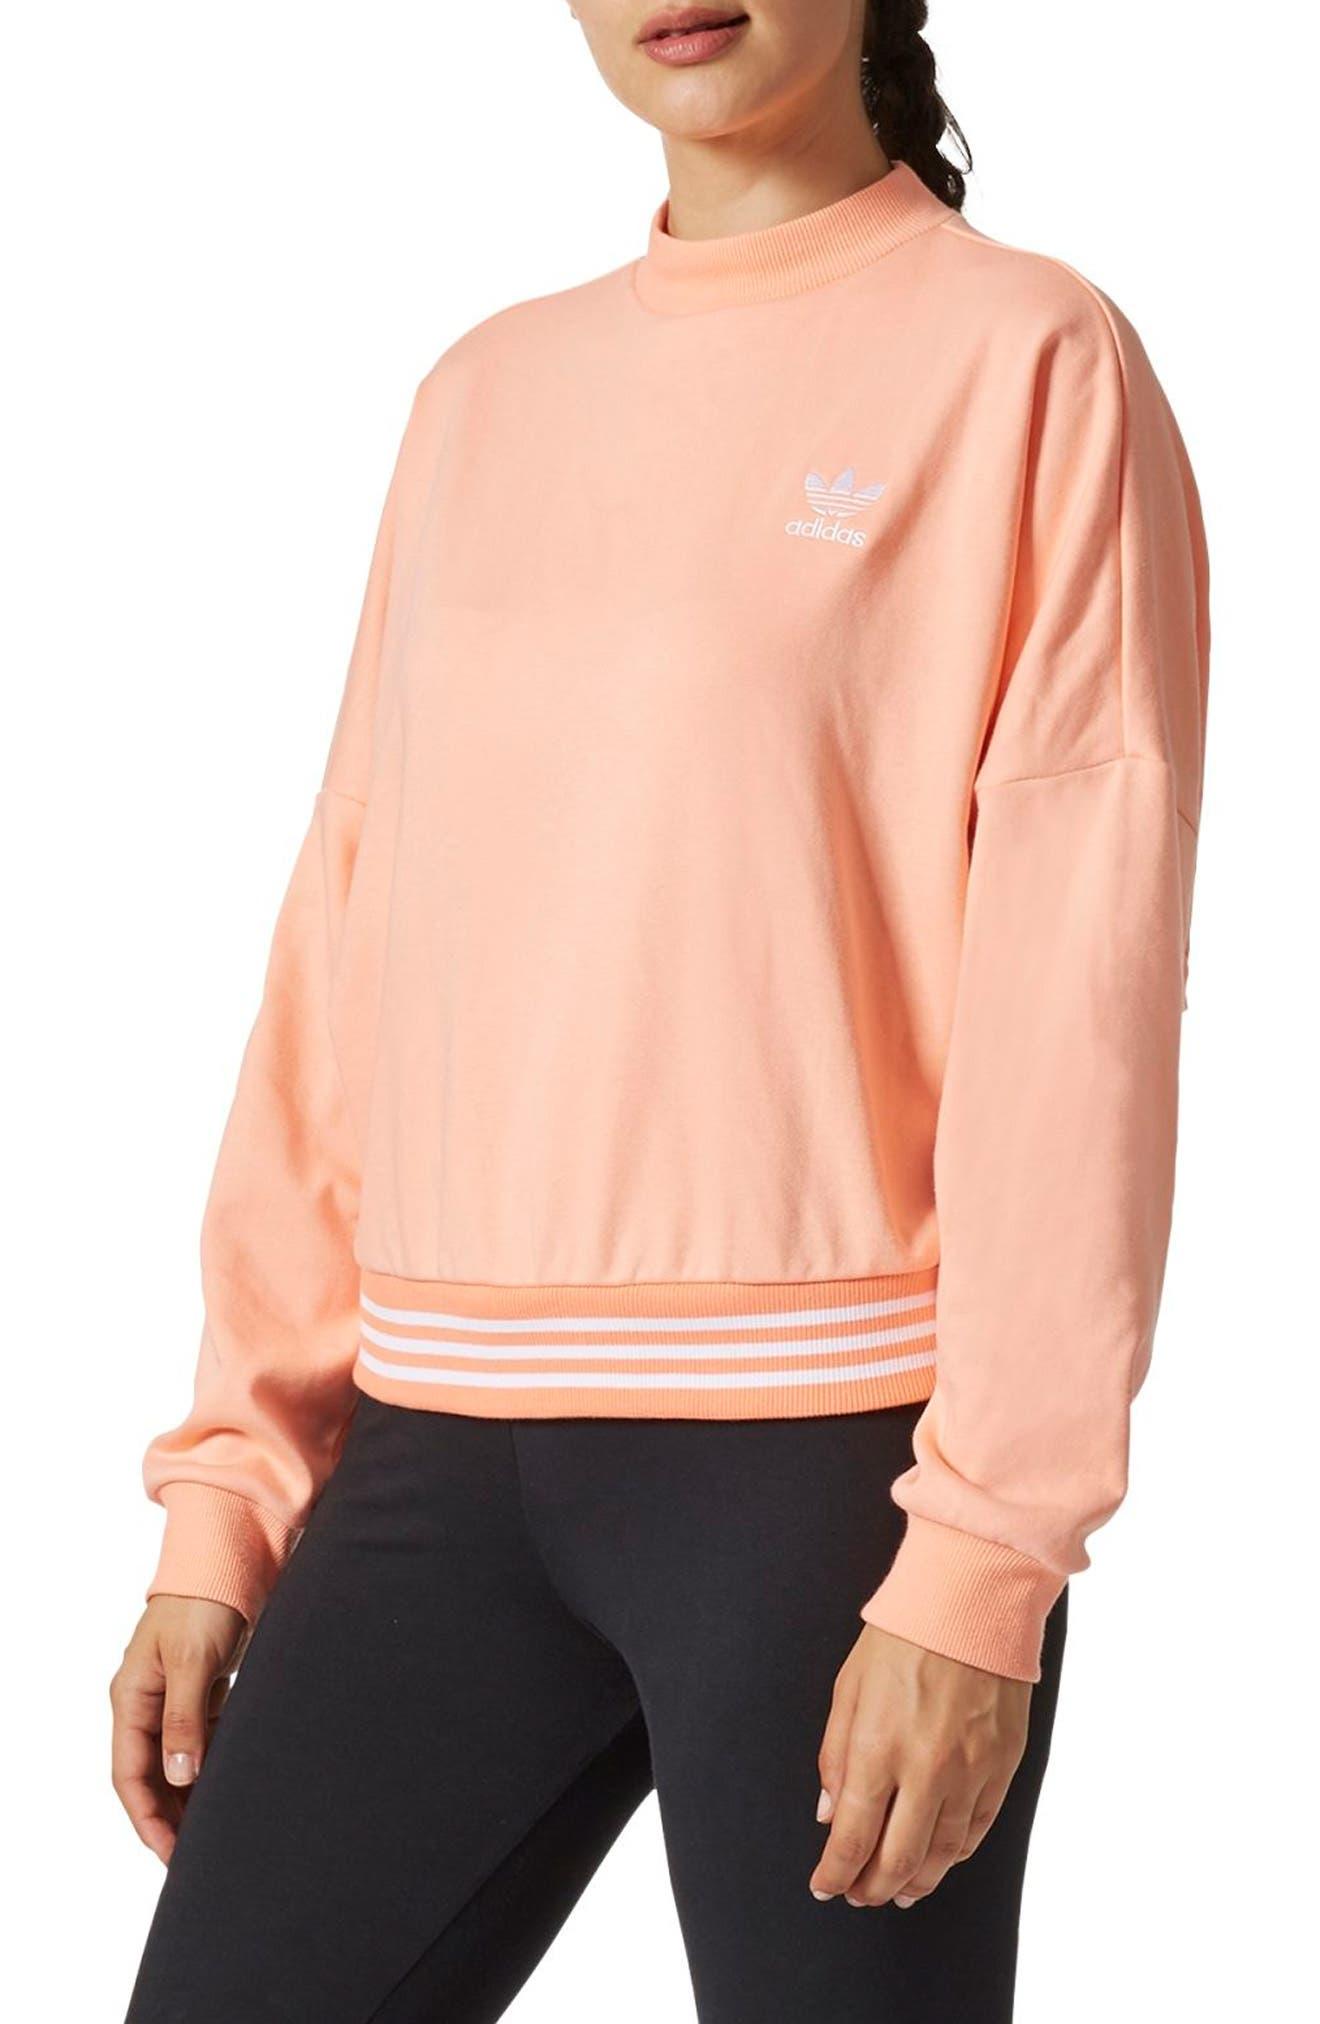 Alternate Image 1 Selected - adidas Originals by Pharrell Williams HU Sweater